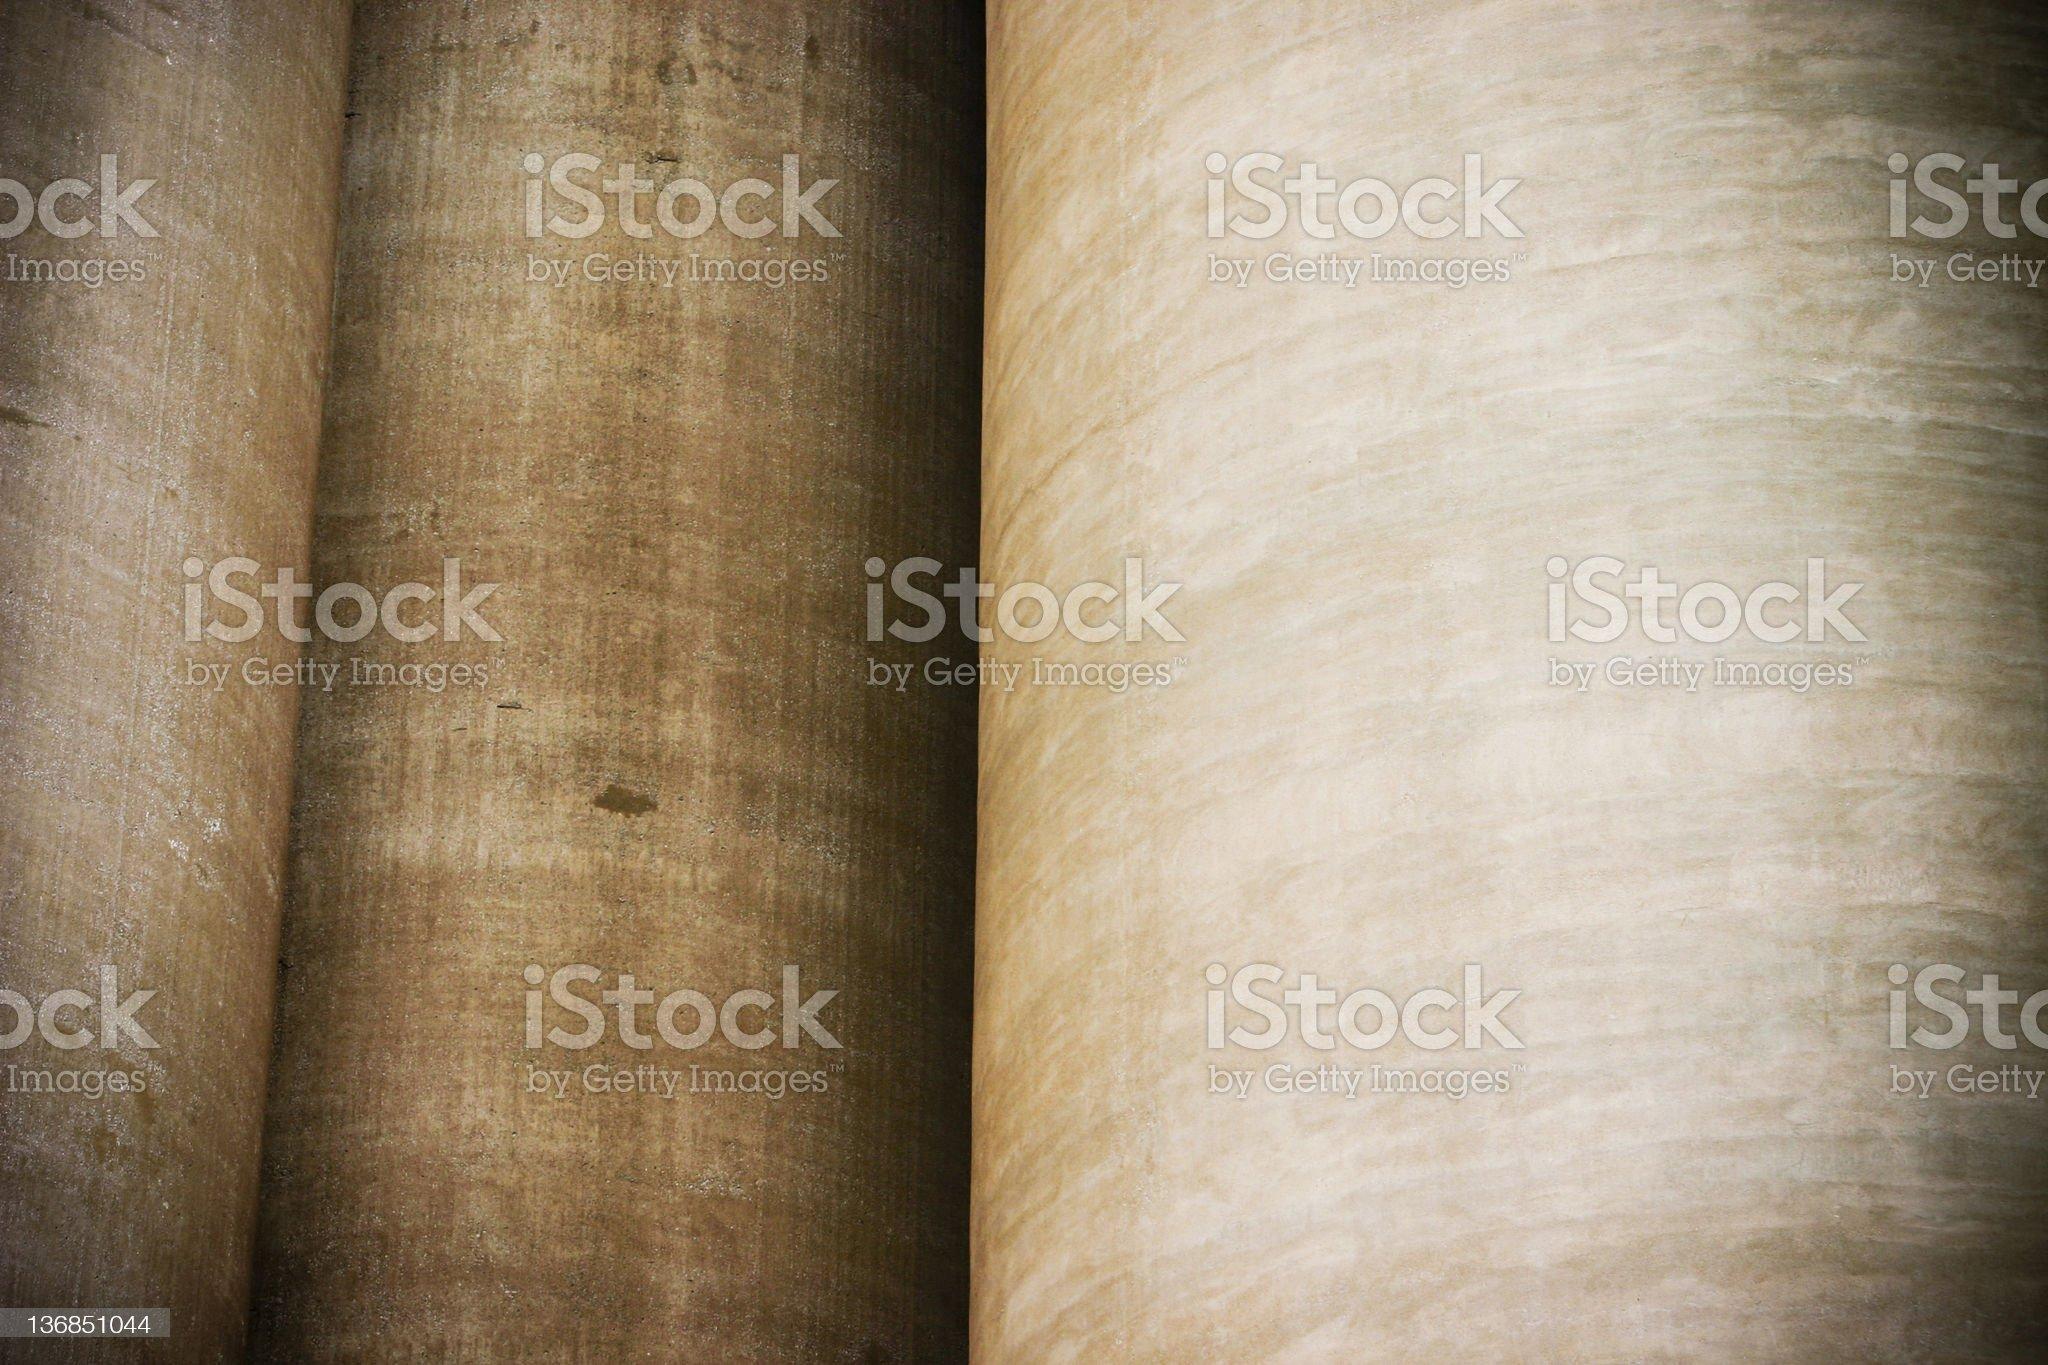 Cylindrical background royalty-free stock photo